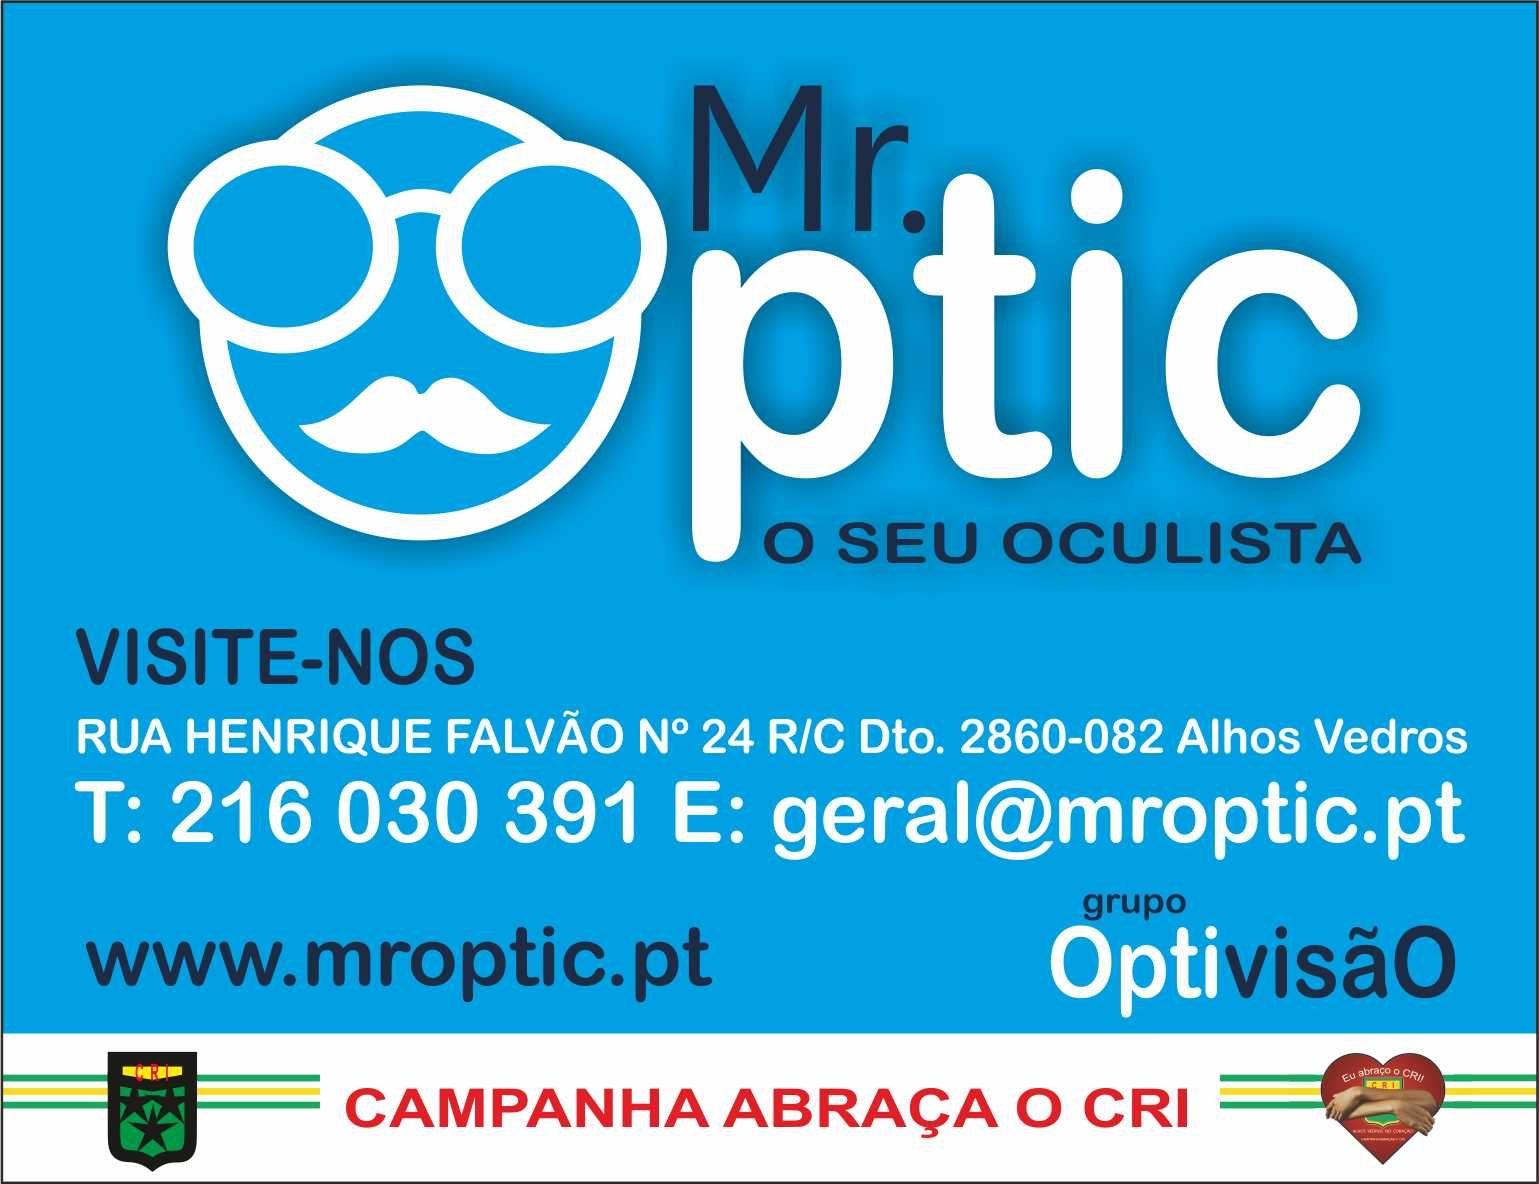 Mr Optic - O seu oculista